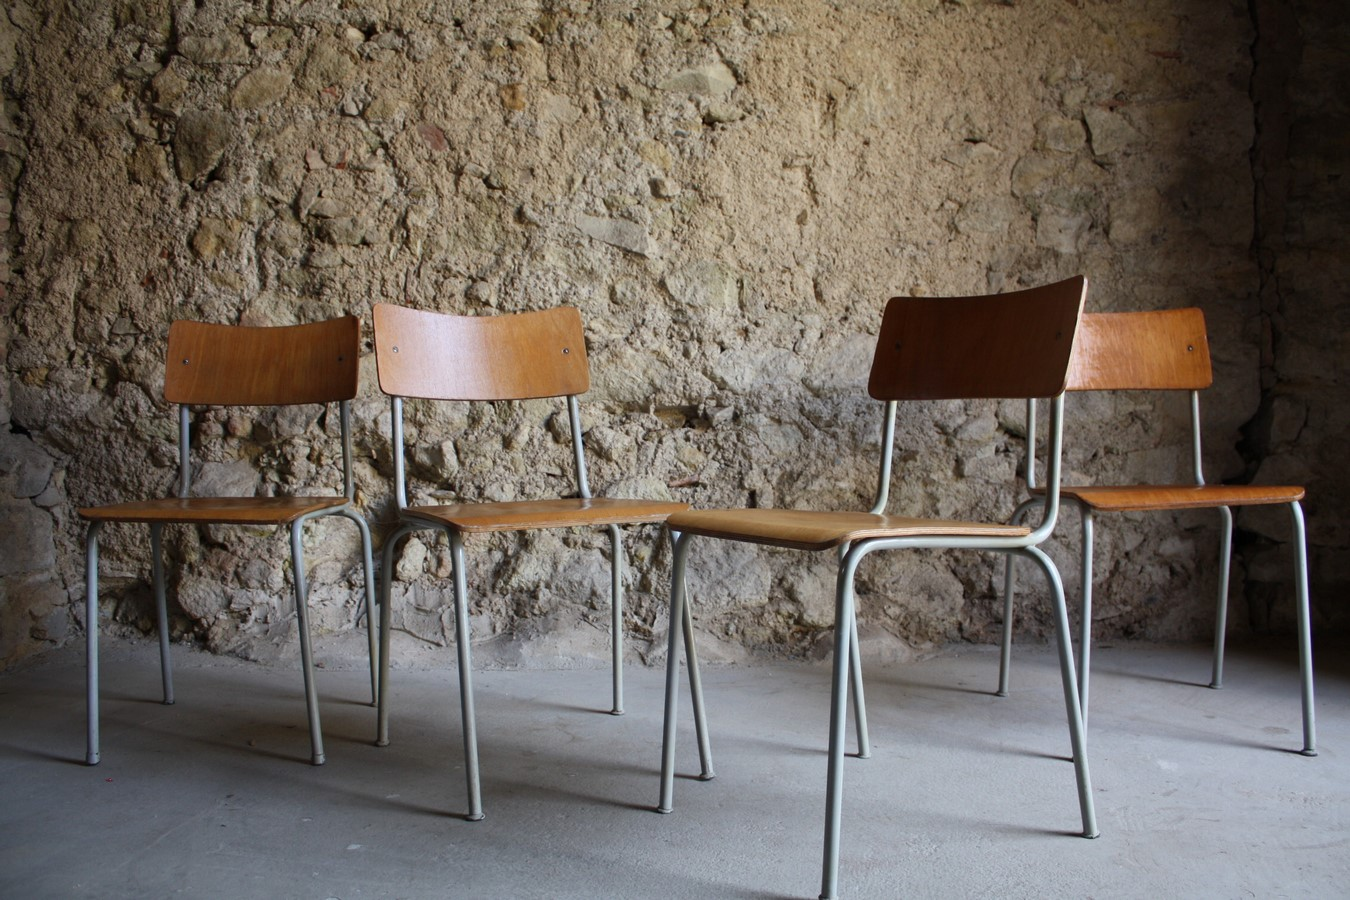 Industrie Design Stühle Stuhl gebraucht Vintage Loft Holz (72) a